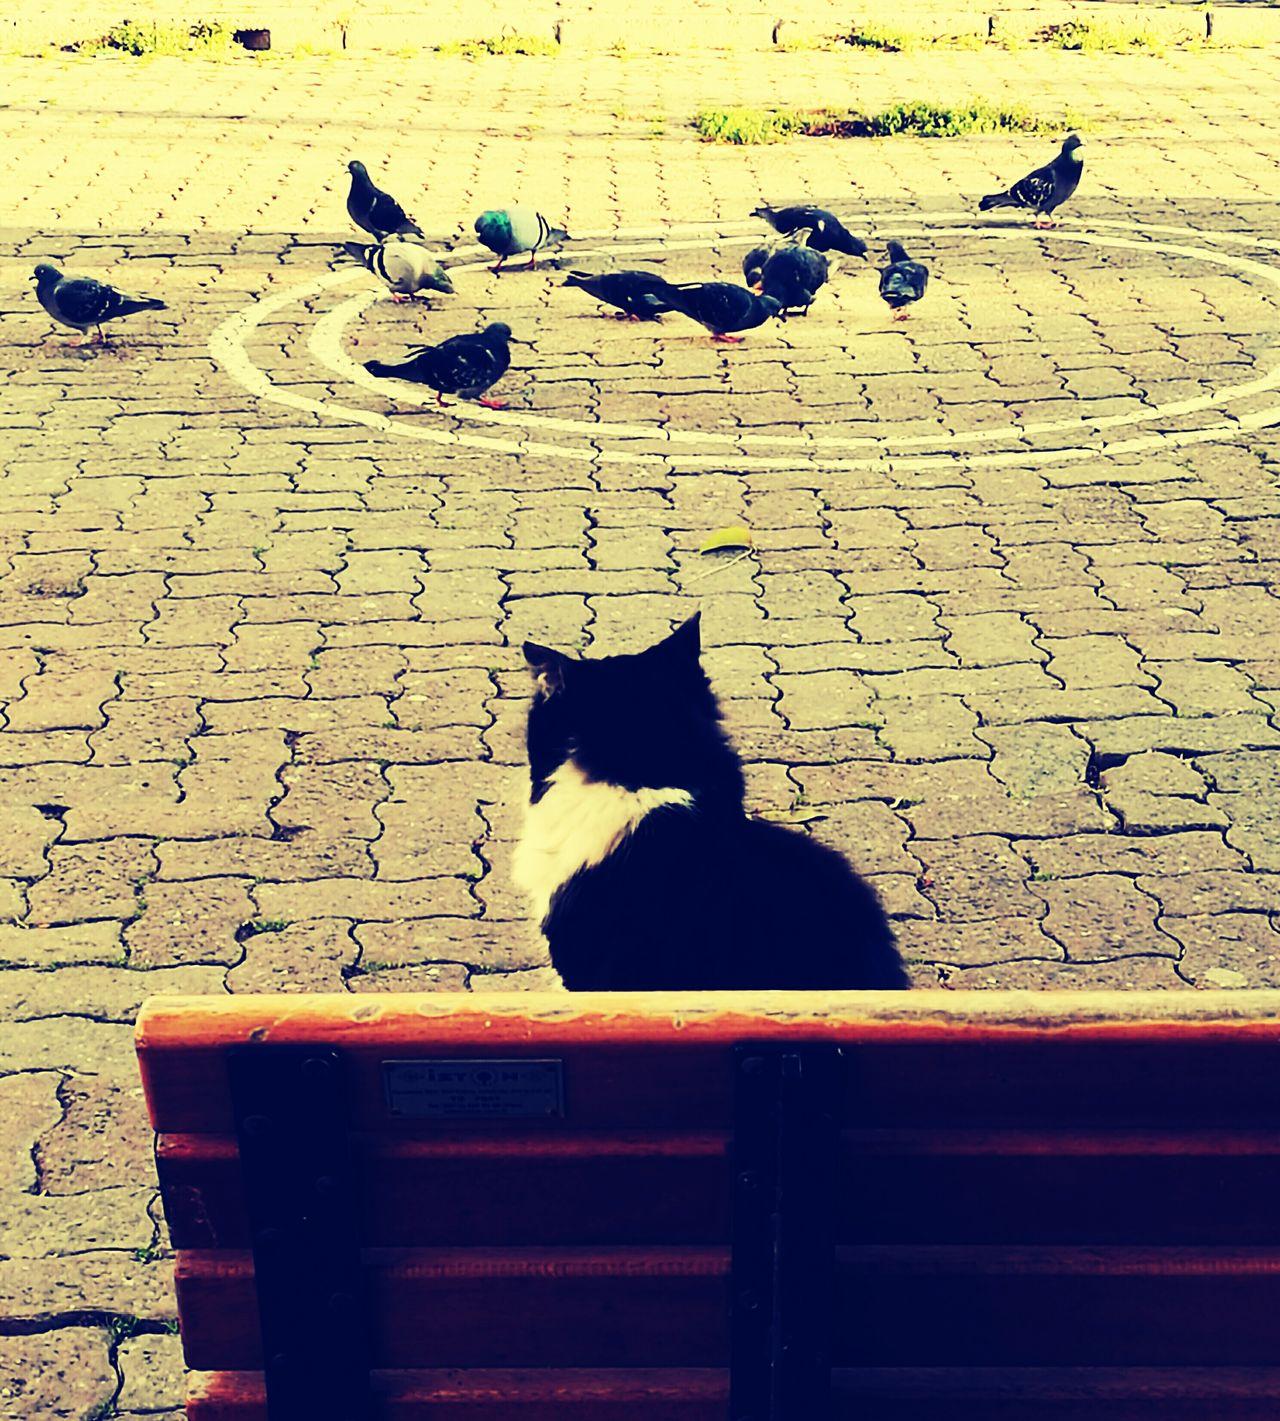 Pets Animal Themes Outdoors No People City Life